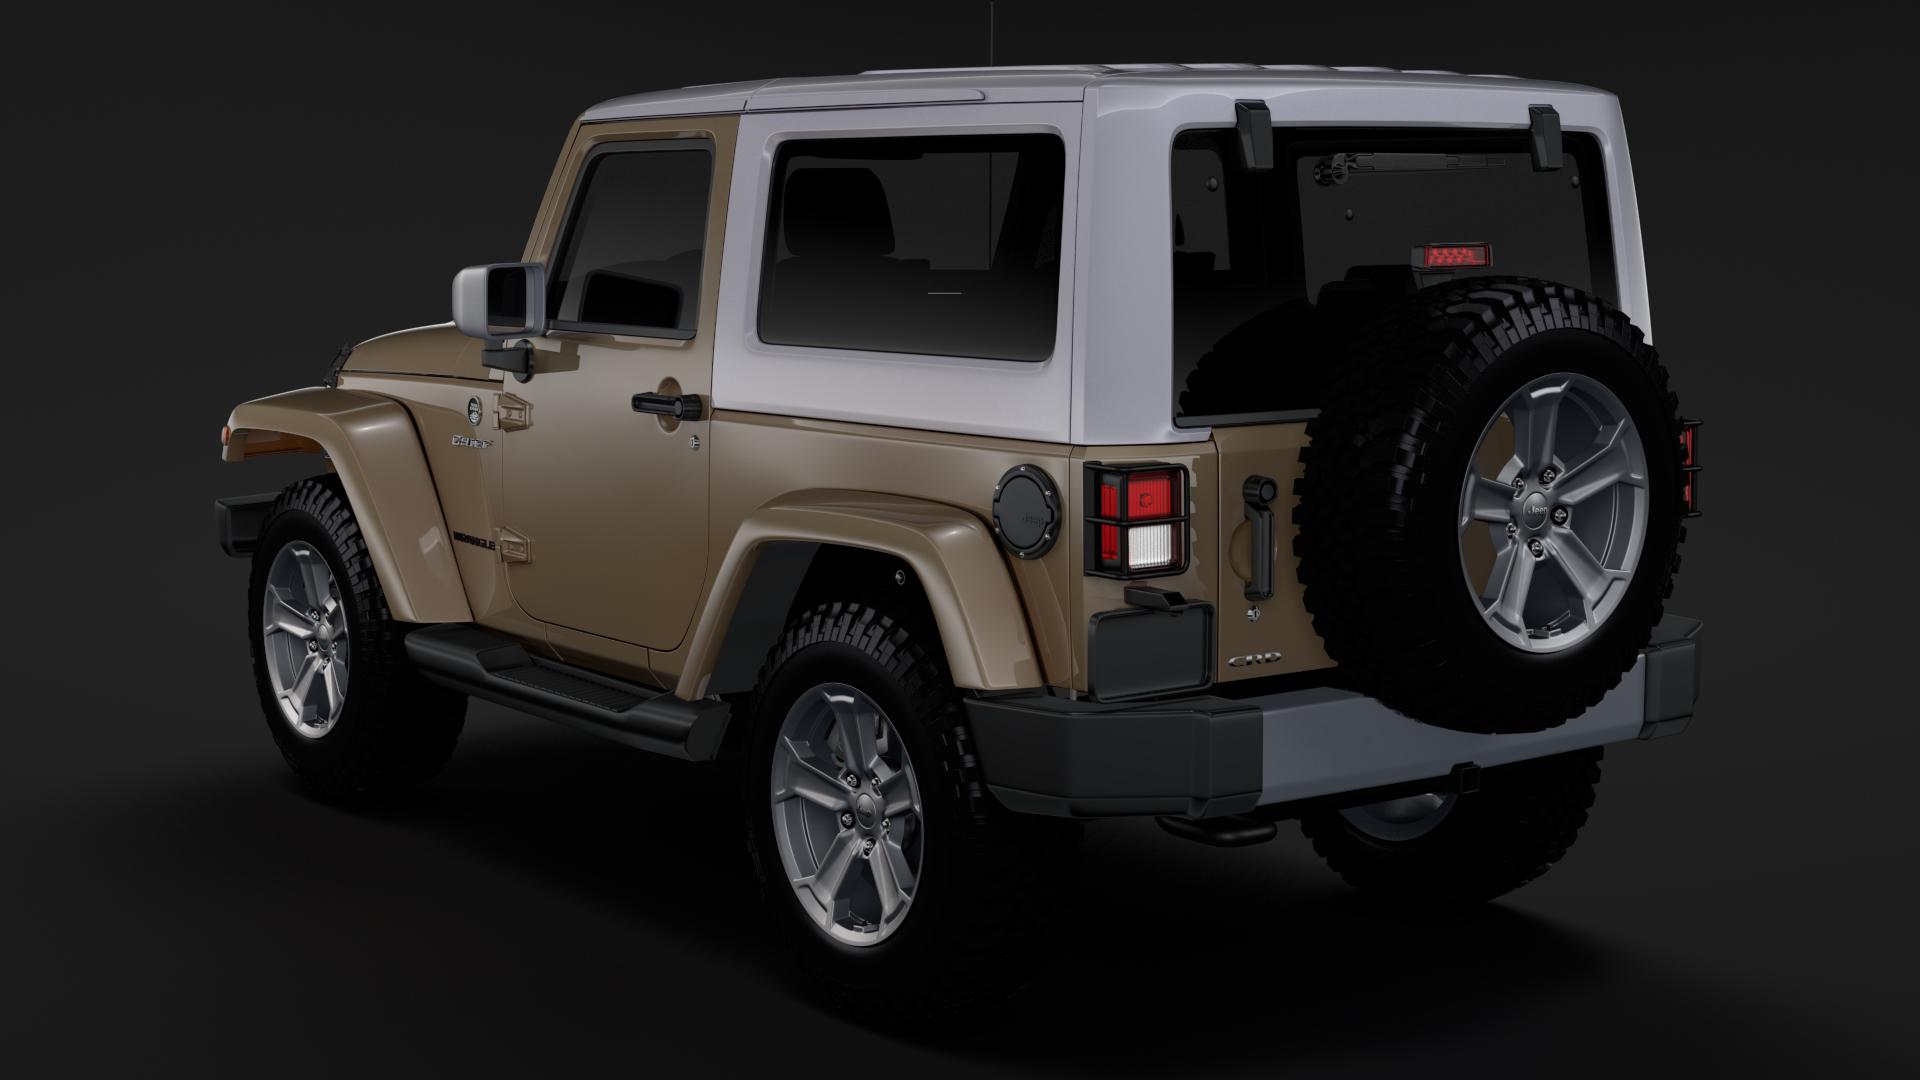 jeep wrangler chief jk 2017 3d model max fbx c4d lwo ma mb hrc xsi obj 276880